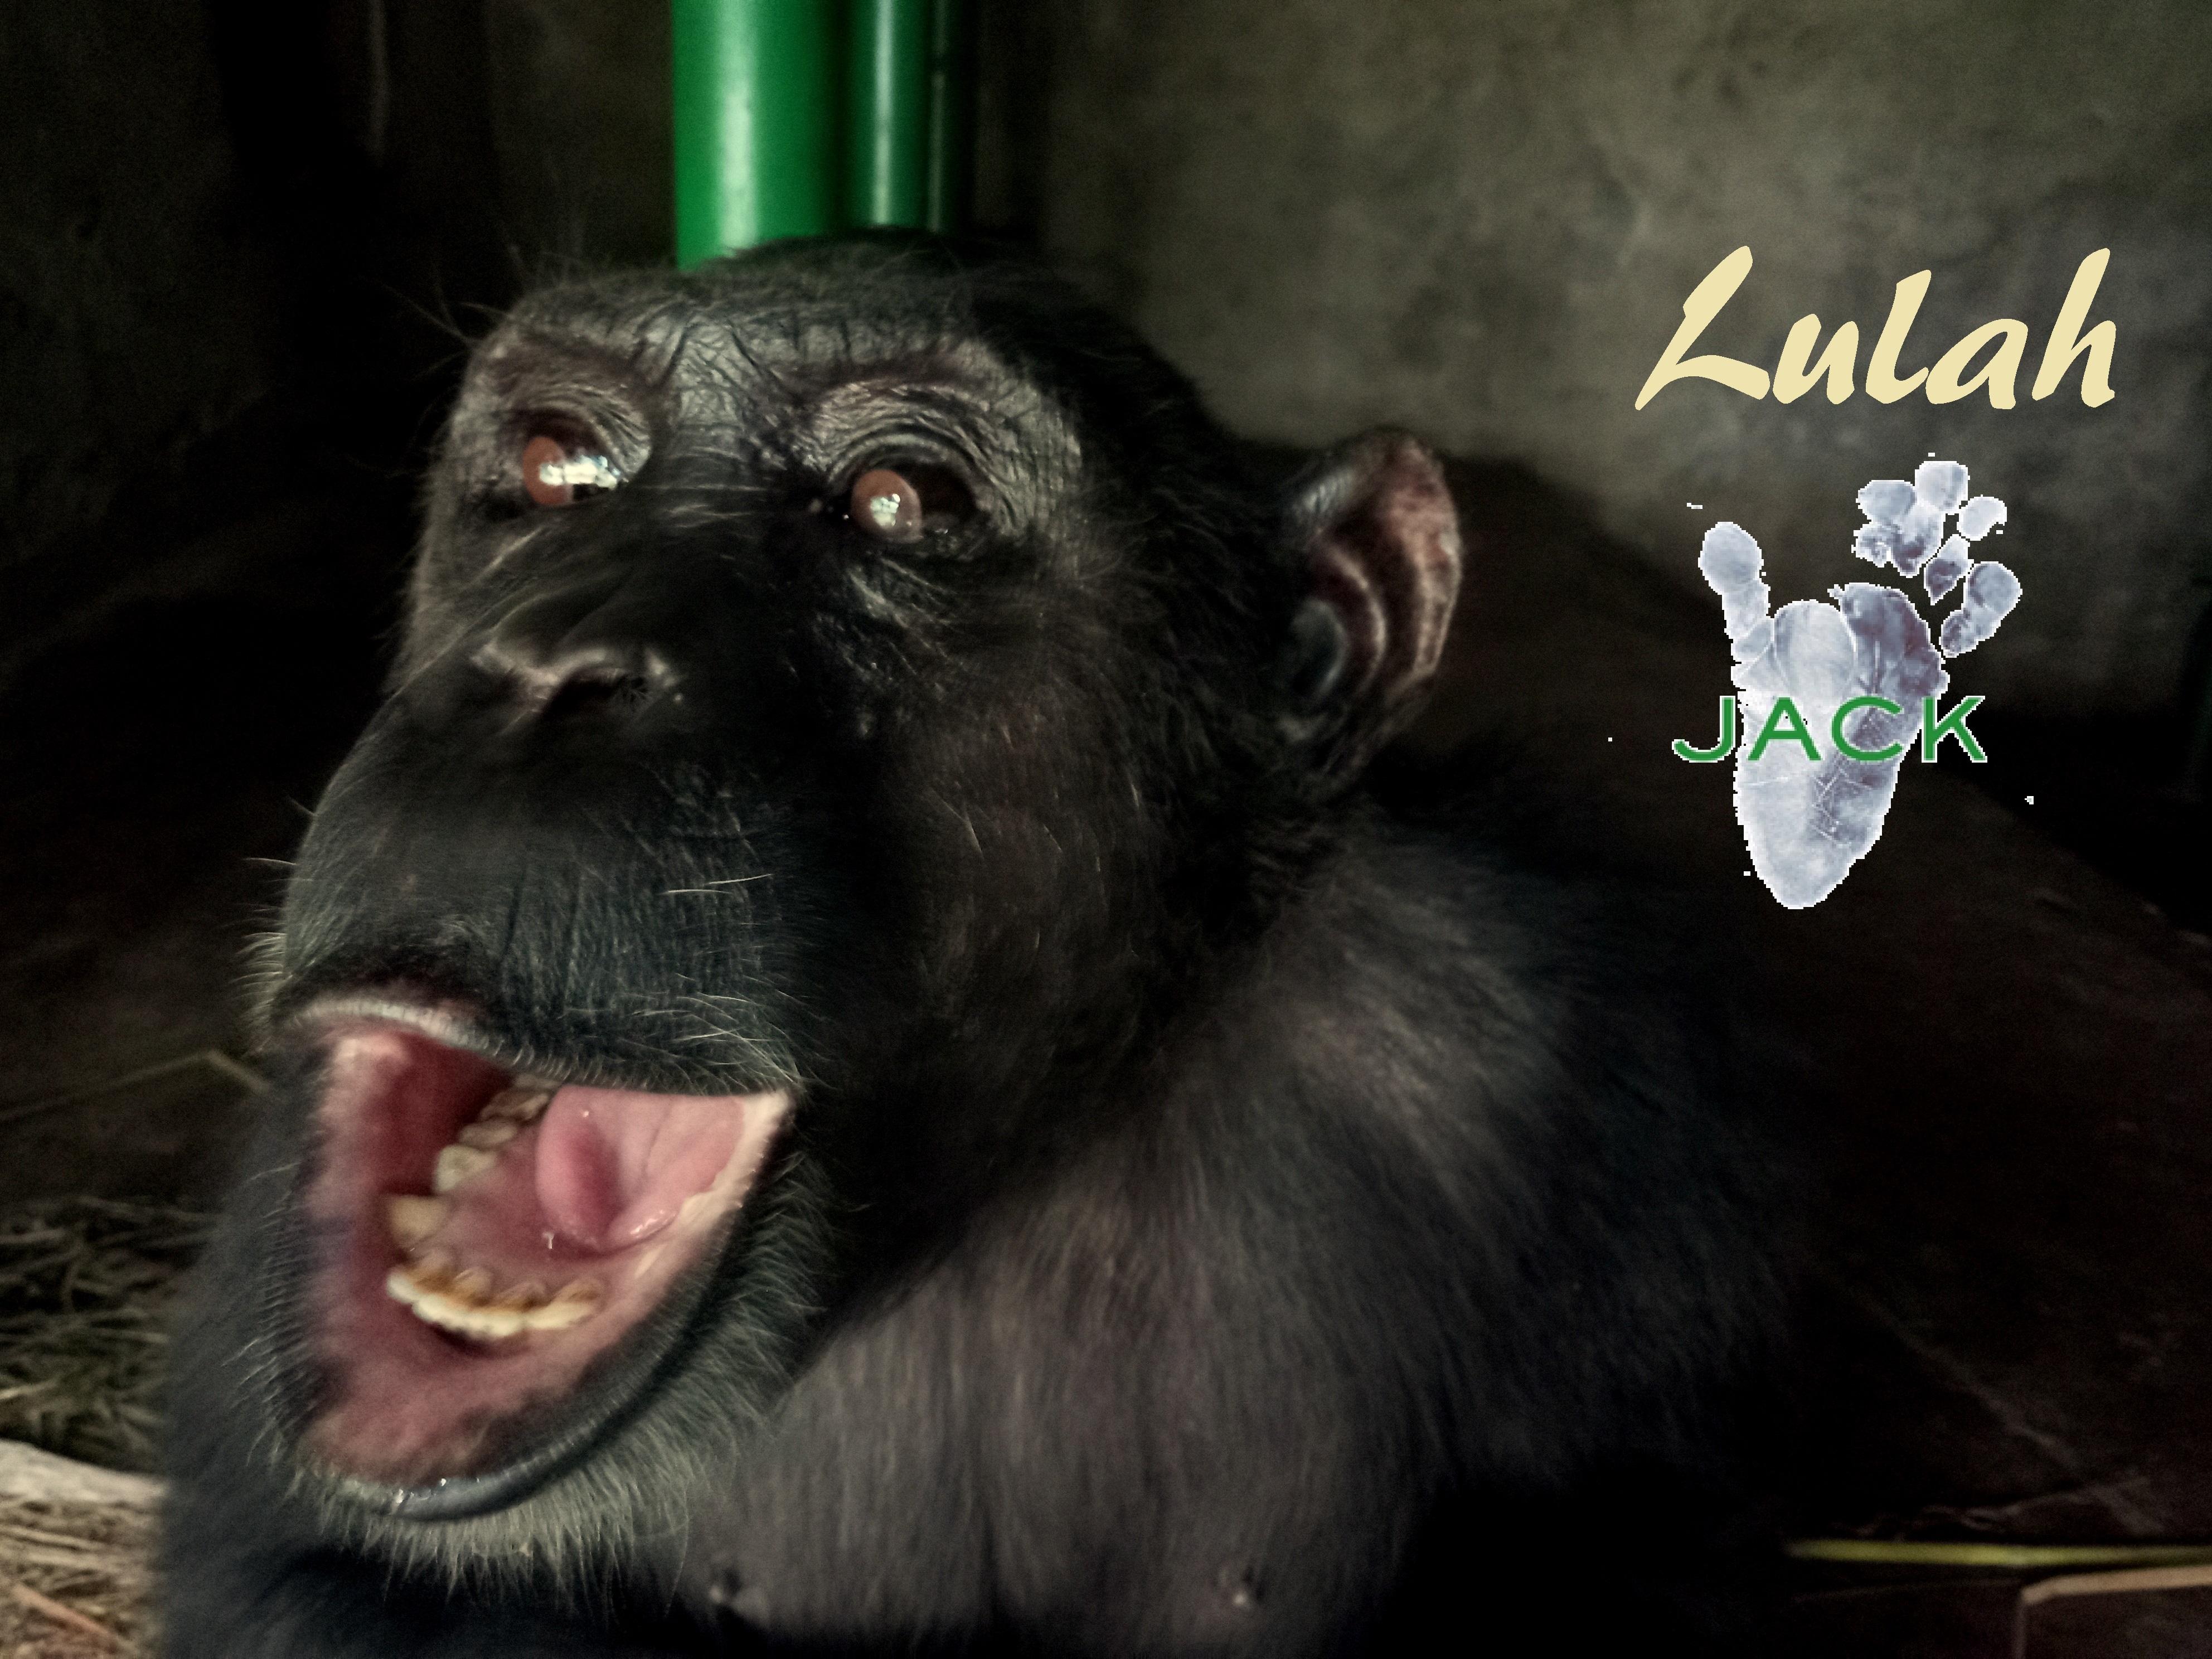 Chimp LULAH is settling in very well!